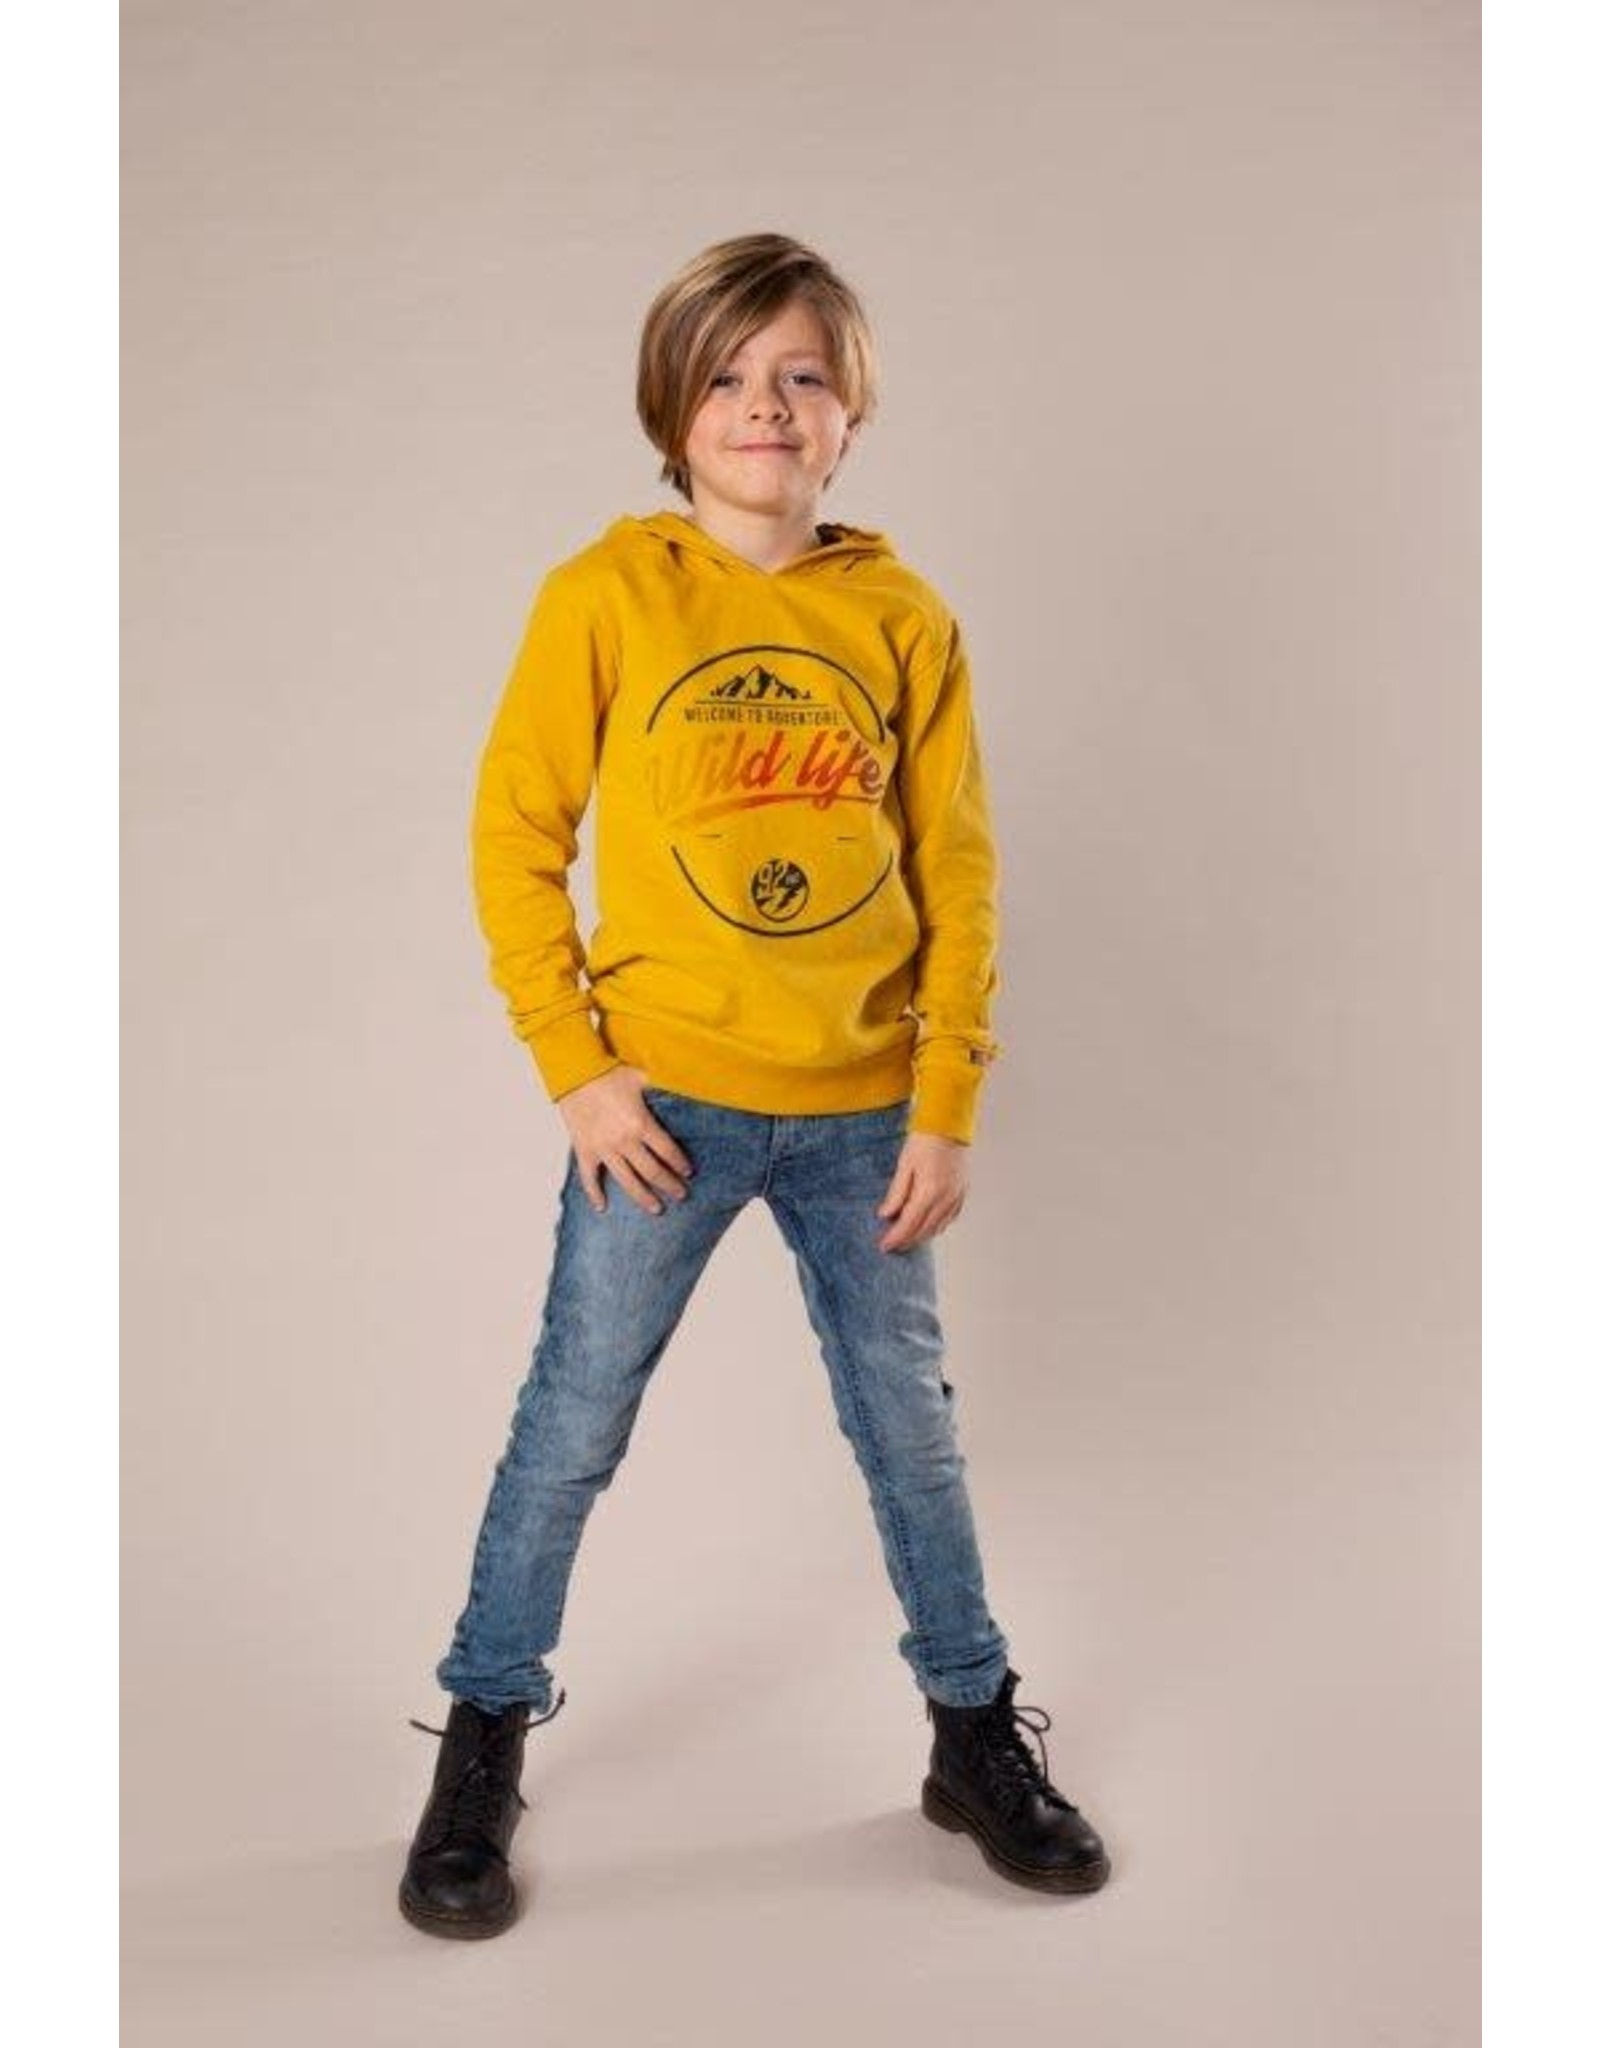 DJ Dutchjeans DJ Dutchjeans jongens hoodie Wild Life Ochre